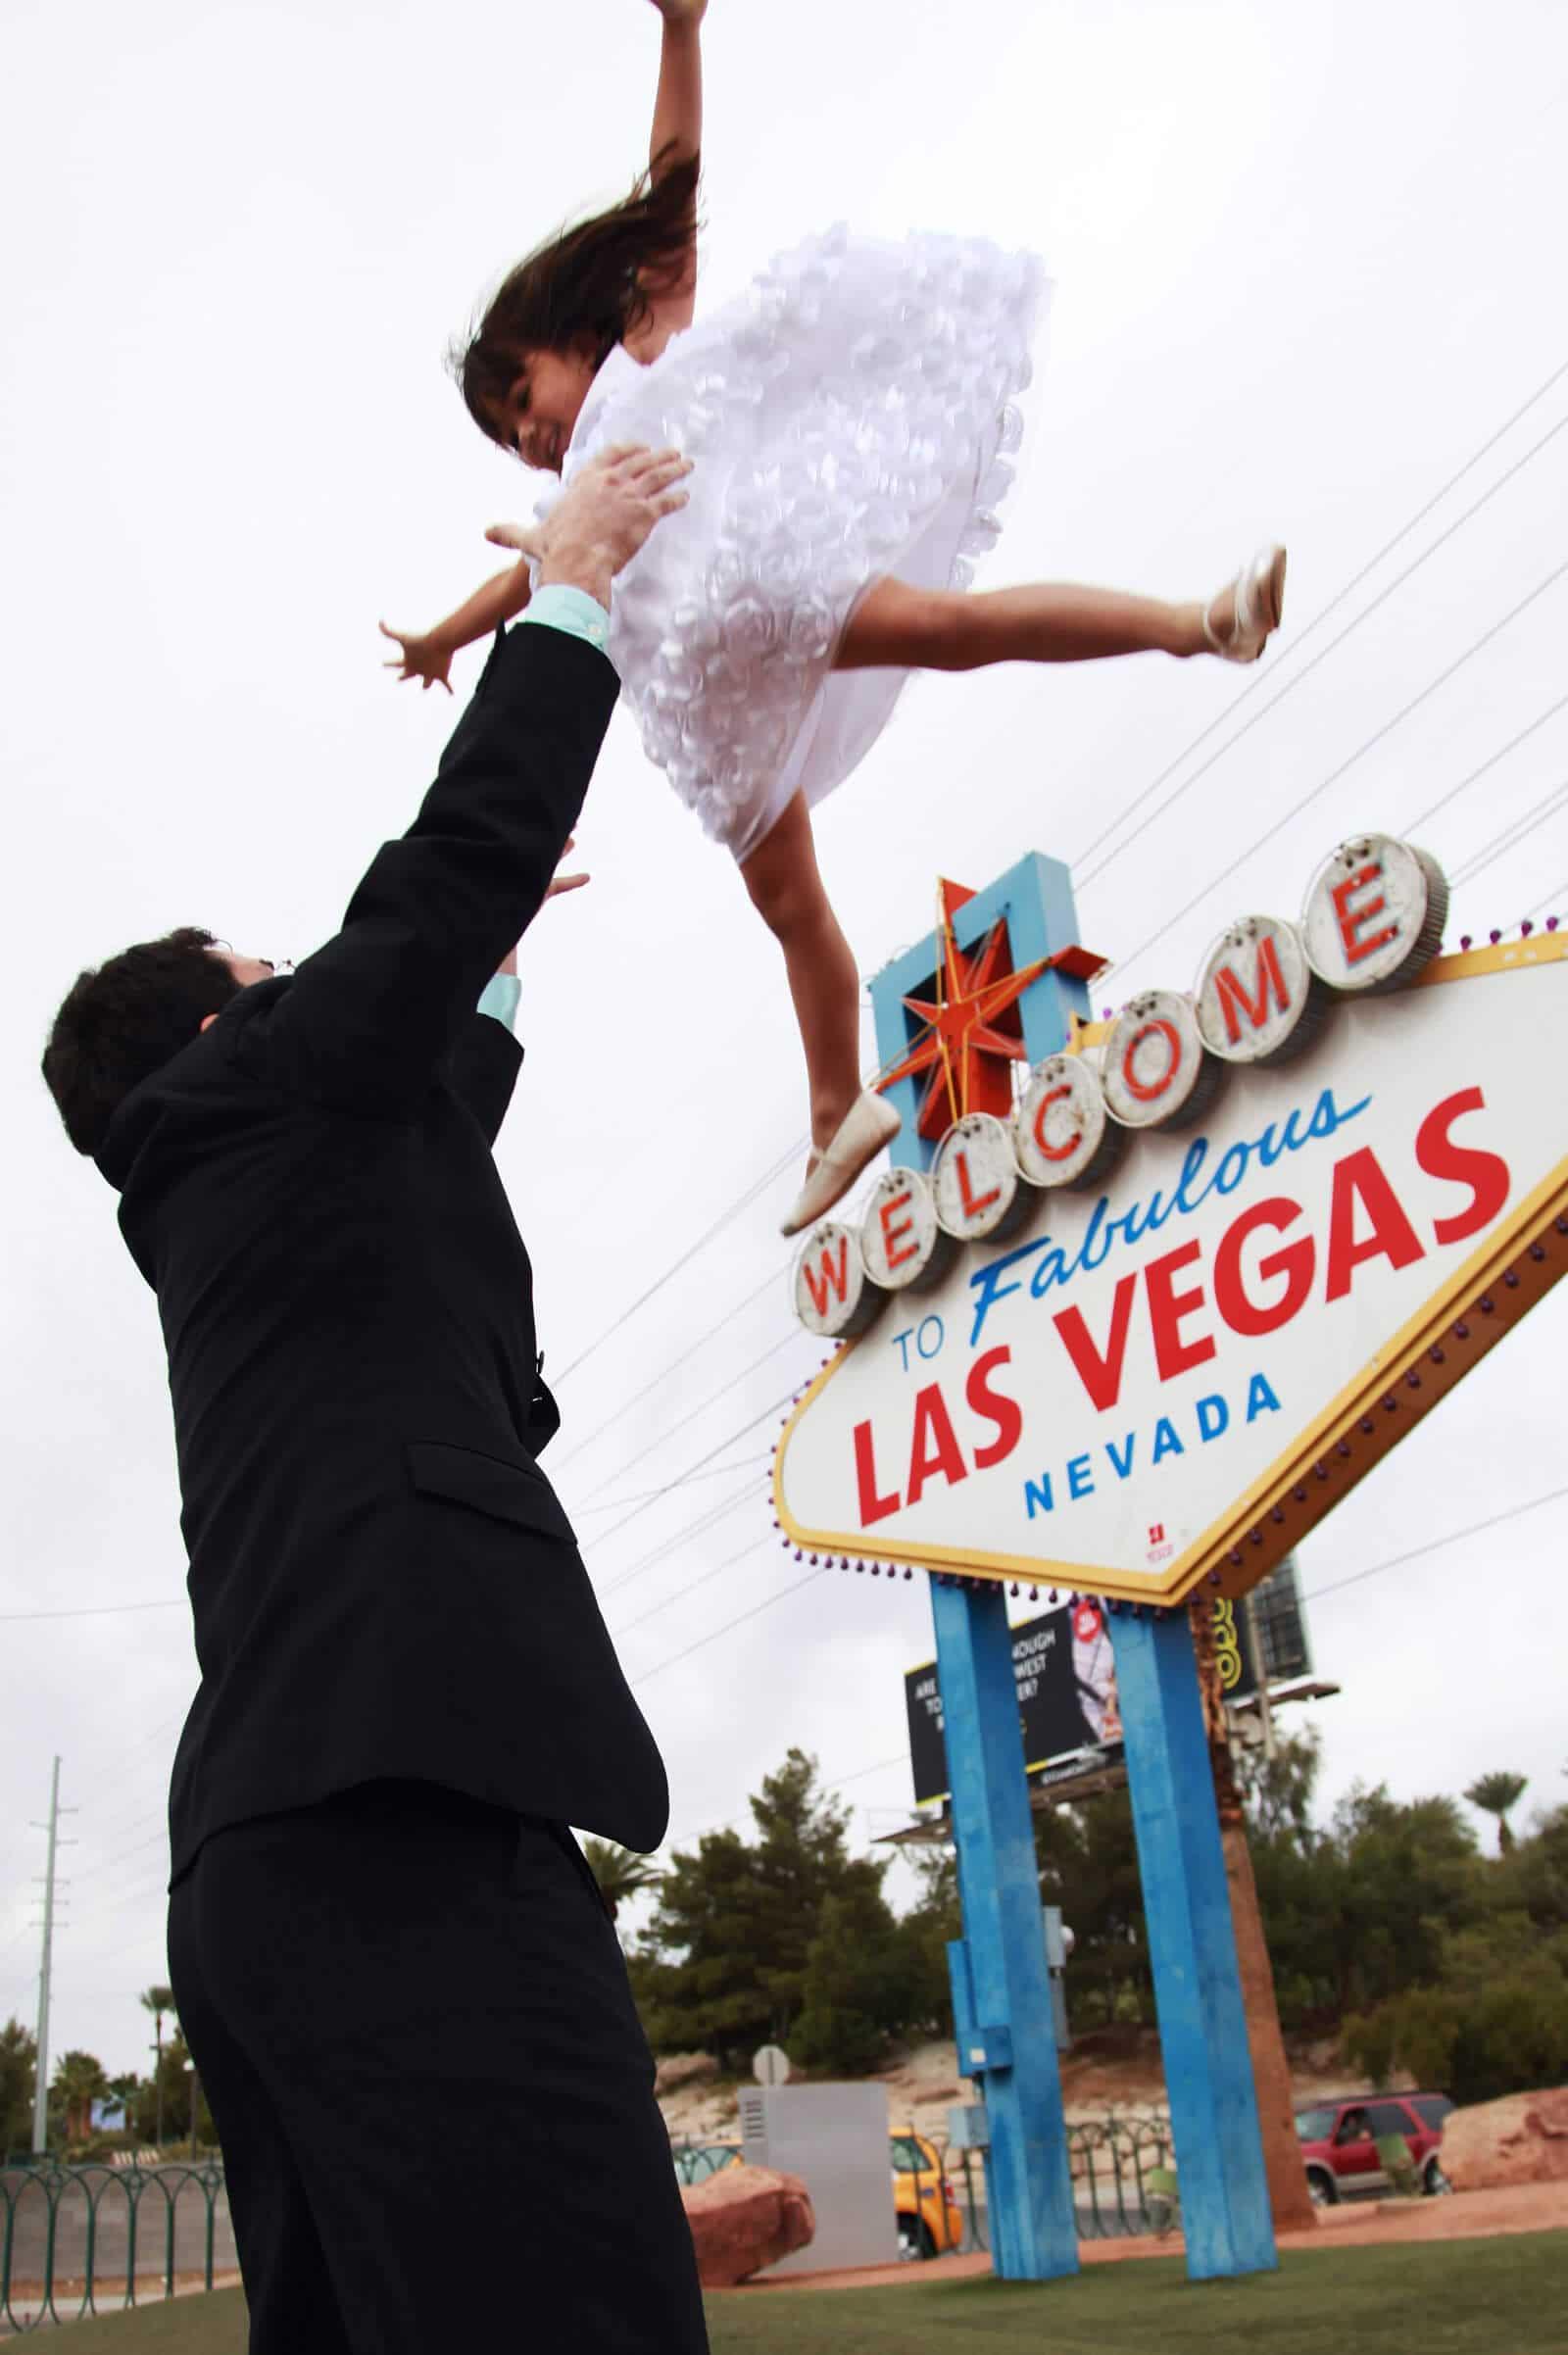 Father Daughter Dance in Las Vegas